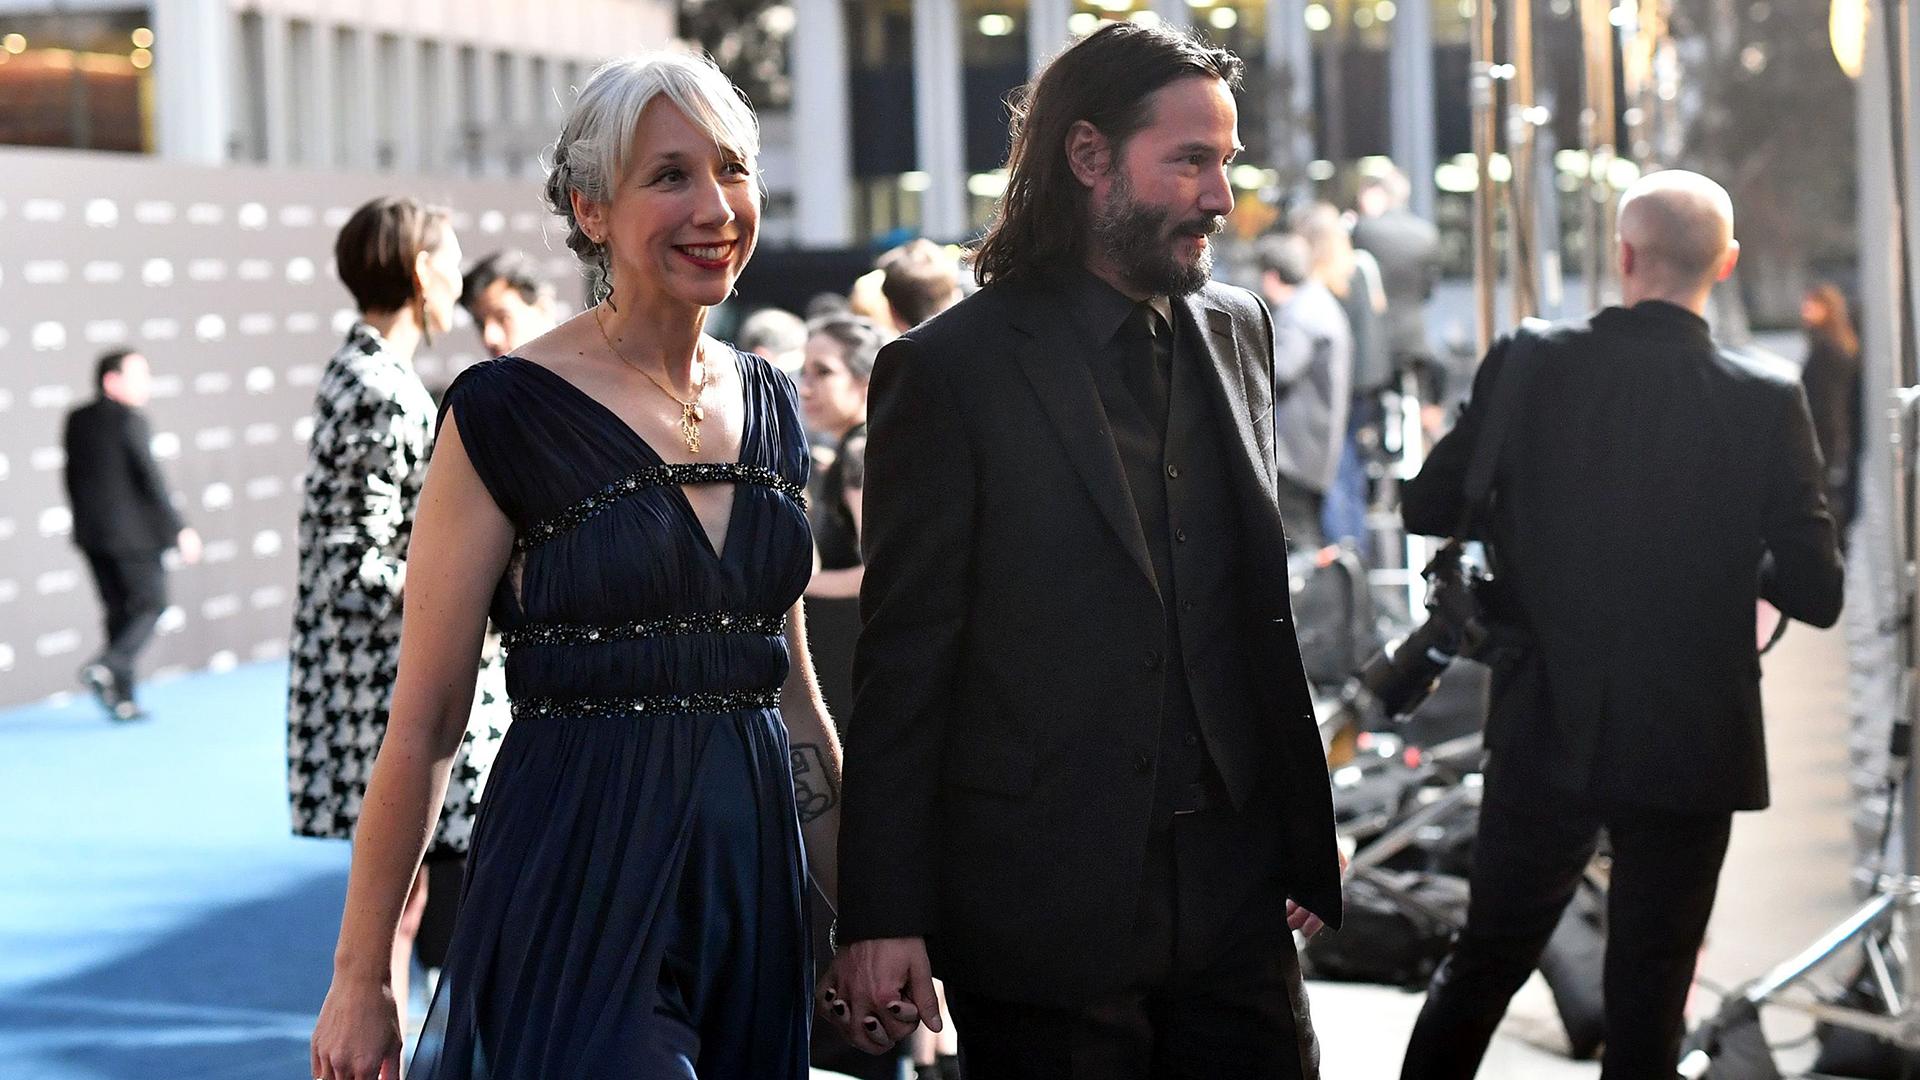 10 datos sobre Alexandra Grant, la nueva novia de Keanu Reeves - Infobae